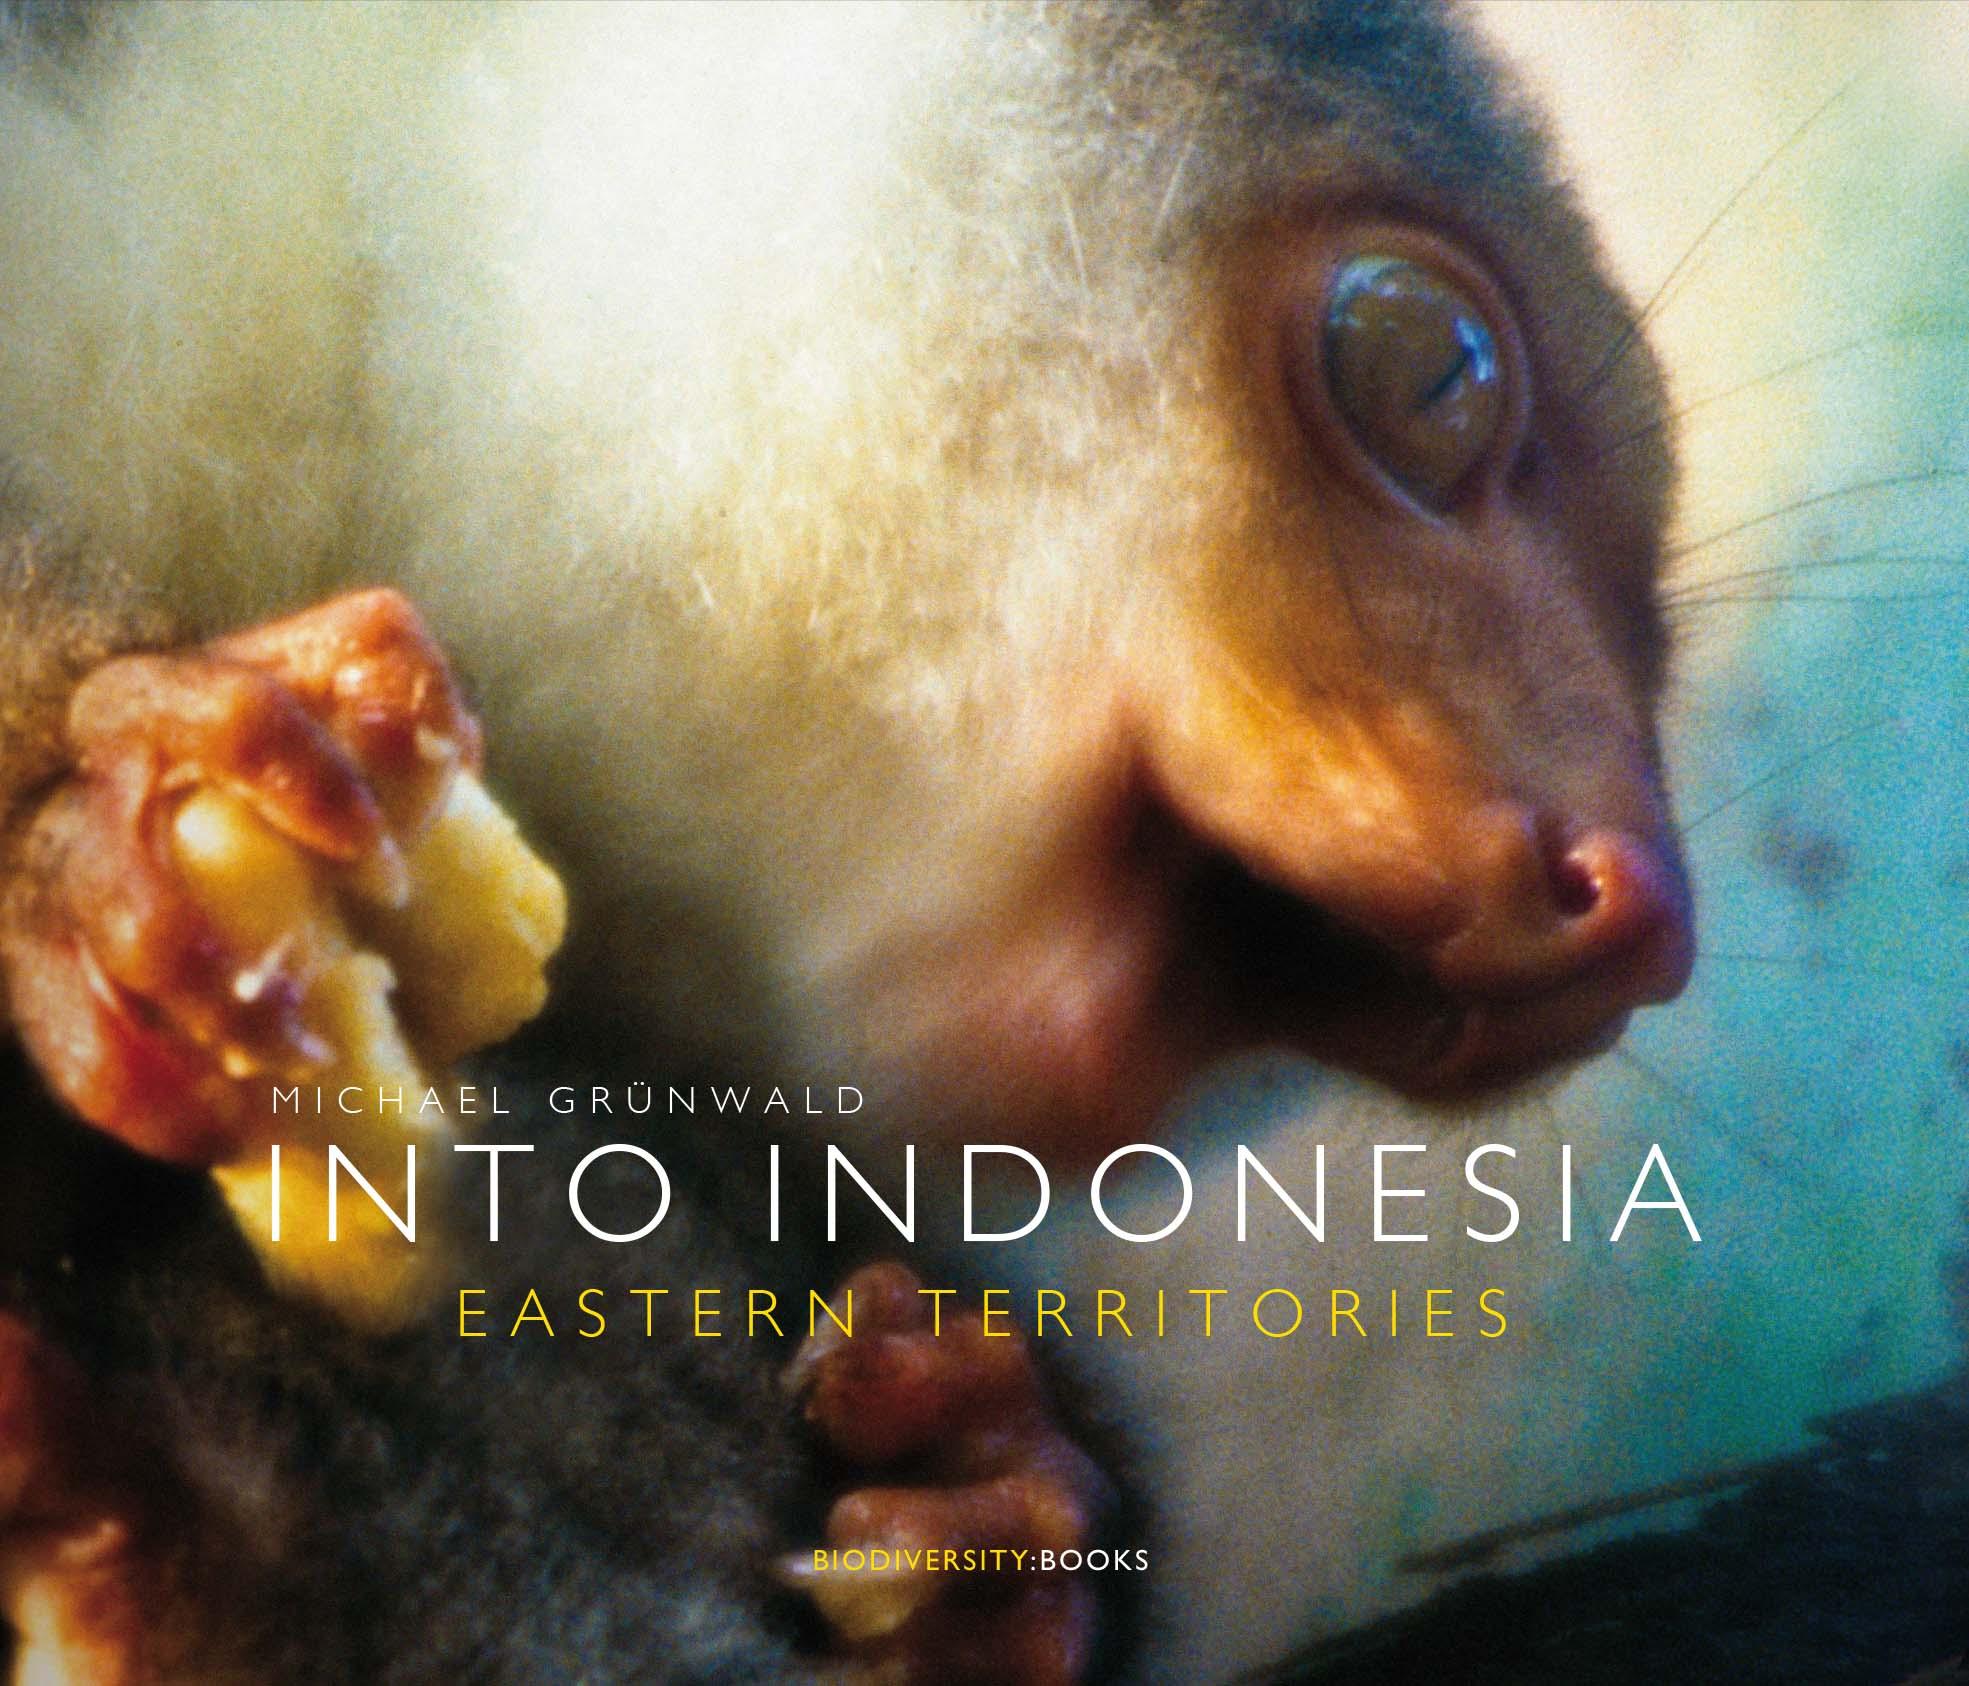 INTO INDONESIA. Eastern Territories